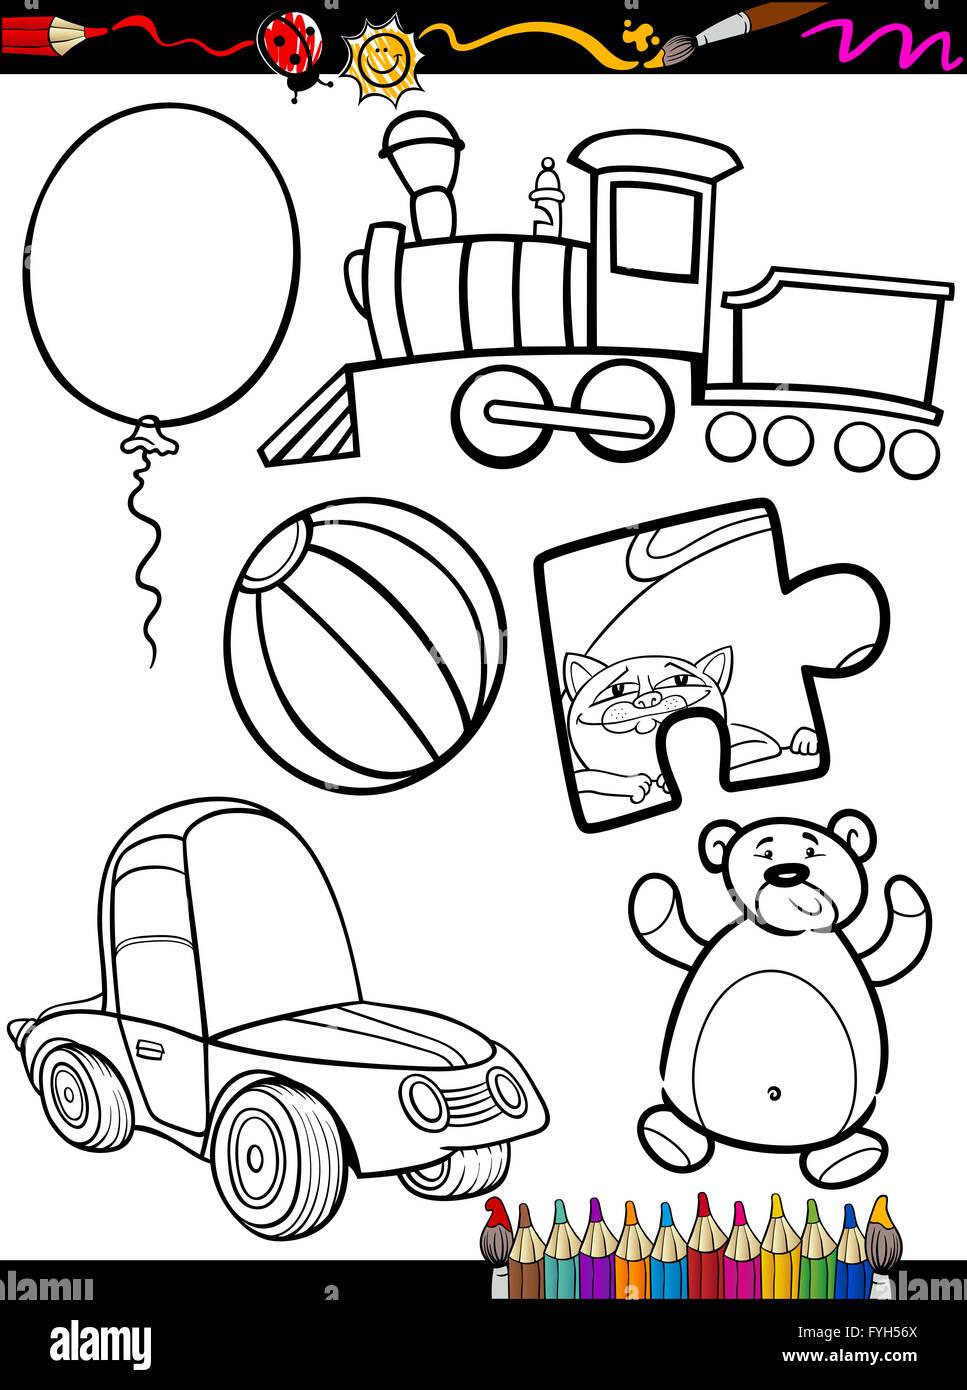 Cartoon Juguetes Objetos Página Para Colorear Foto Imagen De Stock